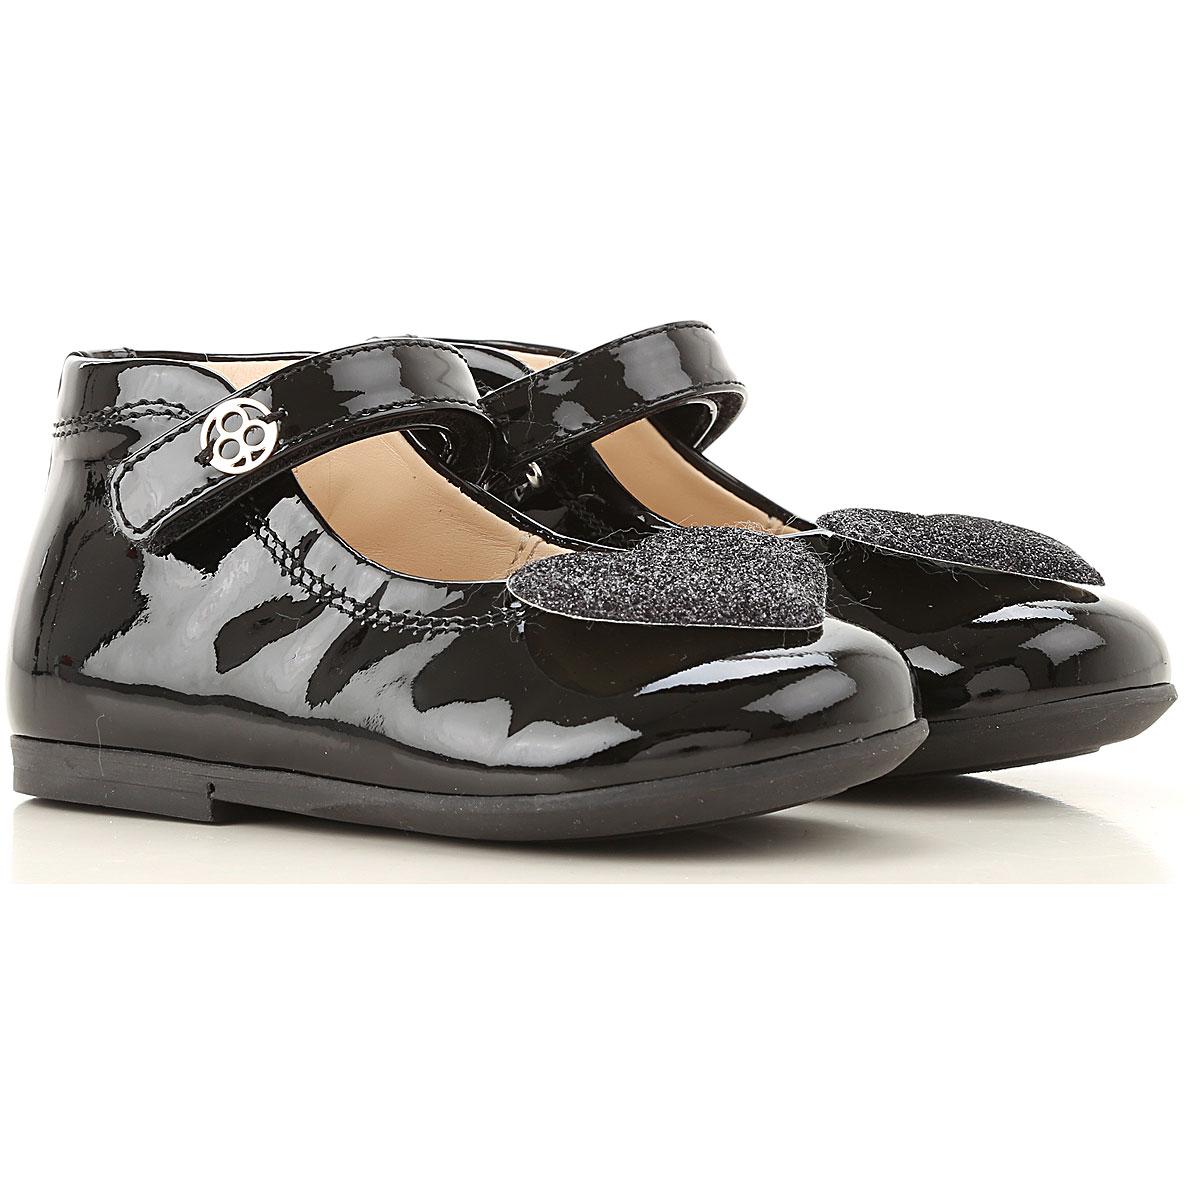 Florens Kids Shoes for Girls On Sale, Black, Rubber, 2019, 20 21 22 23 24 25 26 27 28 29